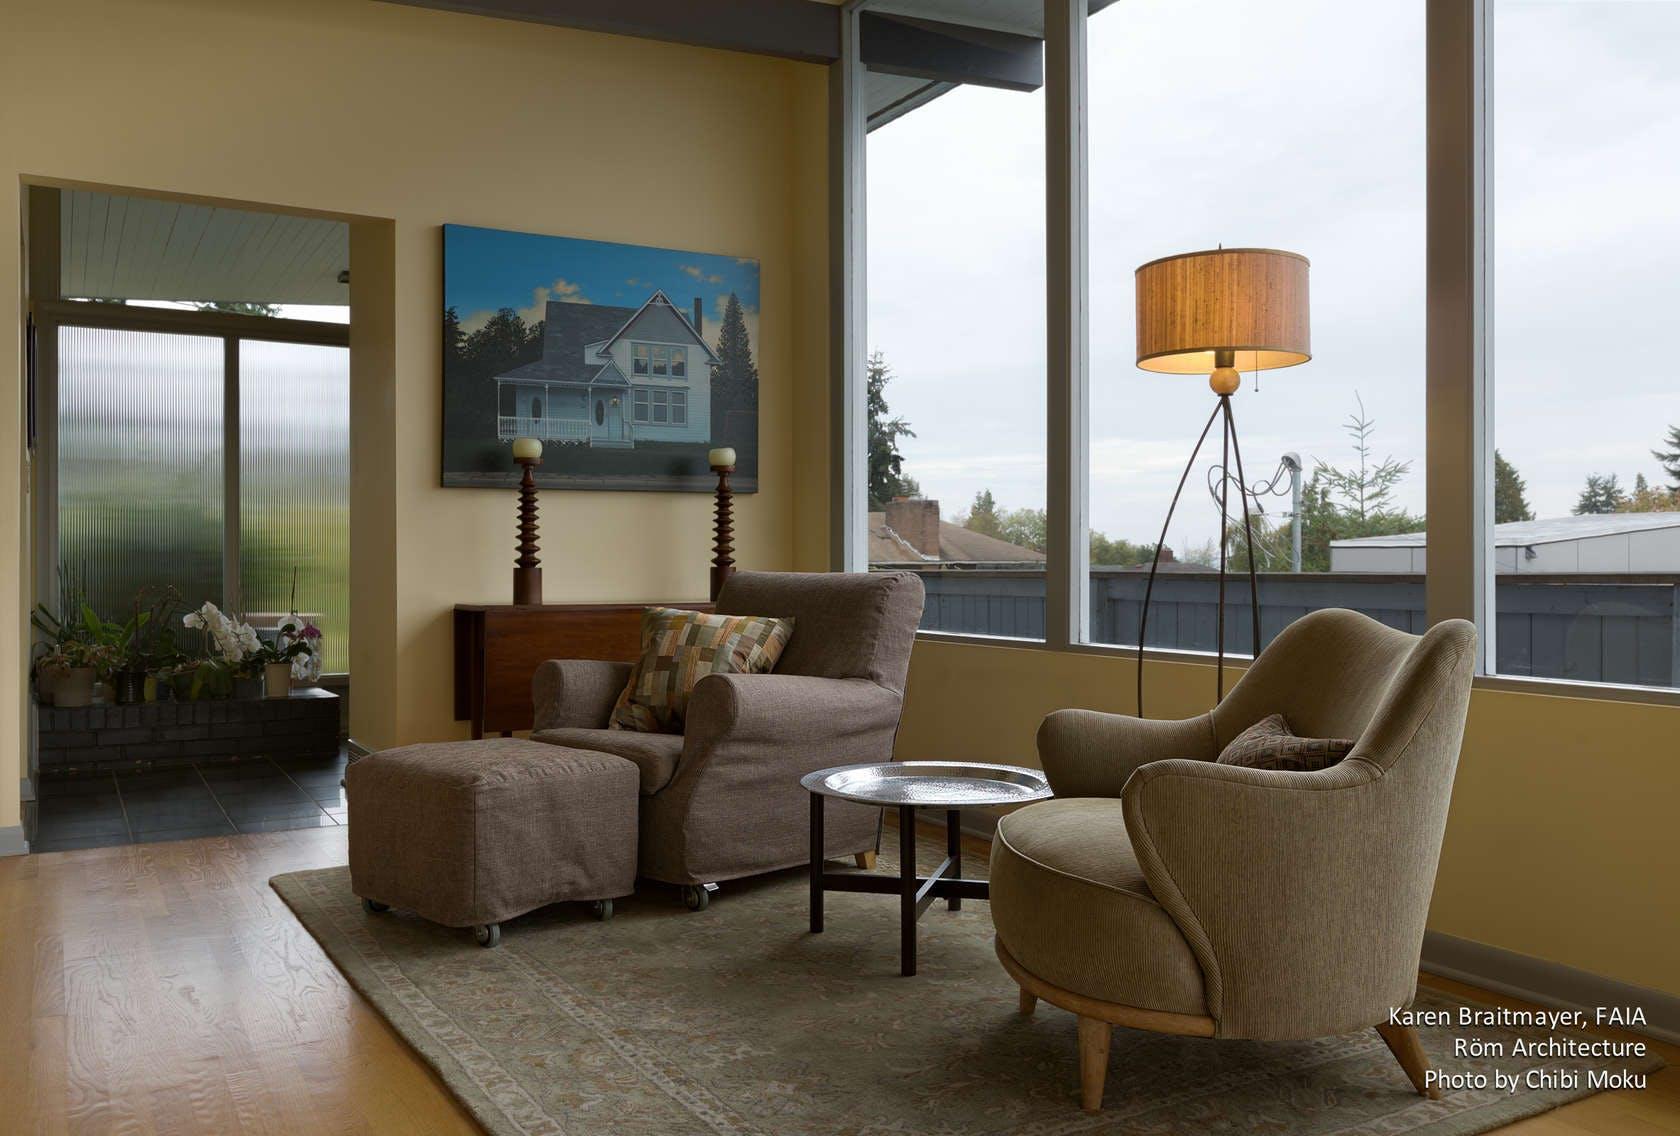 Rom Architecture Karen Braitmayer Mid Century Modern Seattle Wa Chibi Moku Archinect